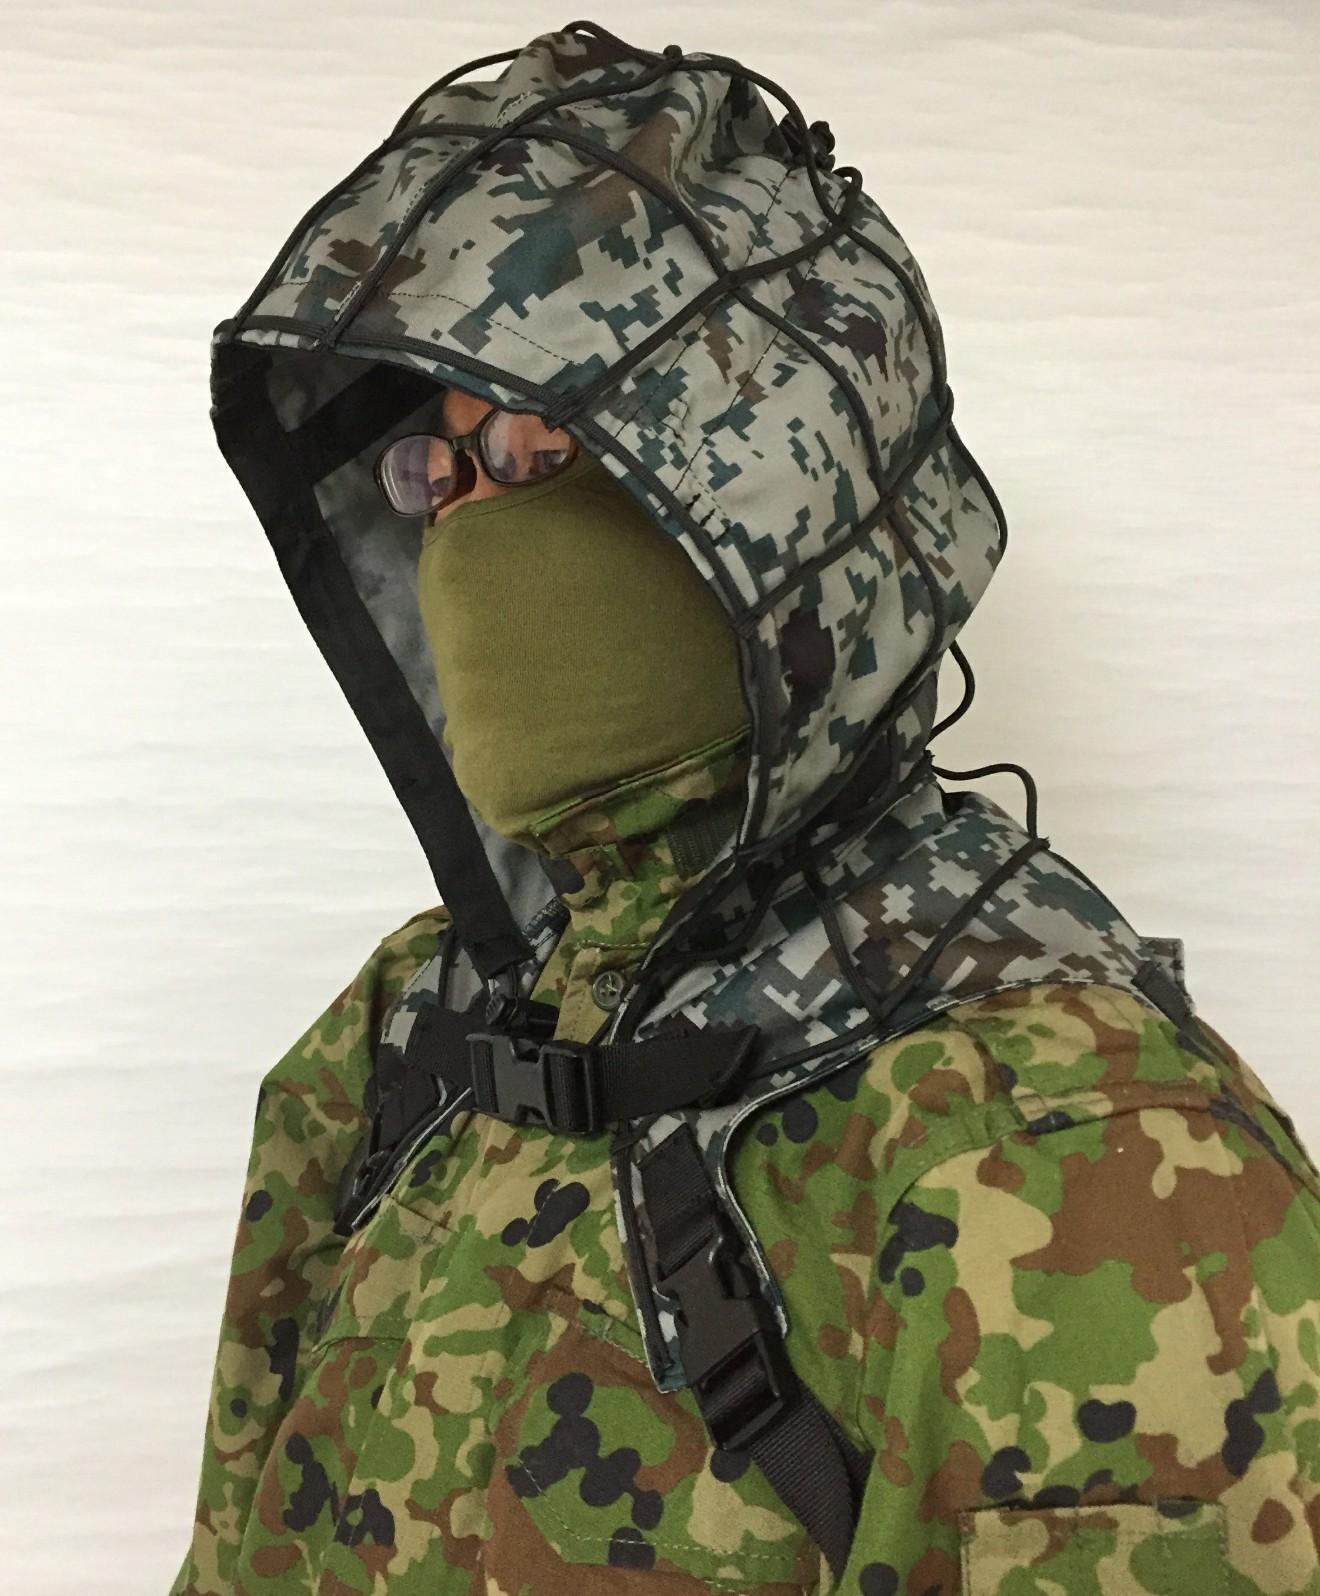 Sukerucom南蛮堂コラボ商品 SDF Tactical Alone Hood タクティカルアローンフード パラコード版 限定色空自迷彩